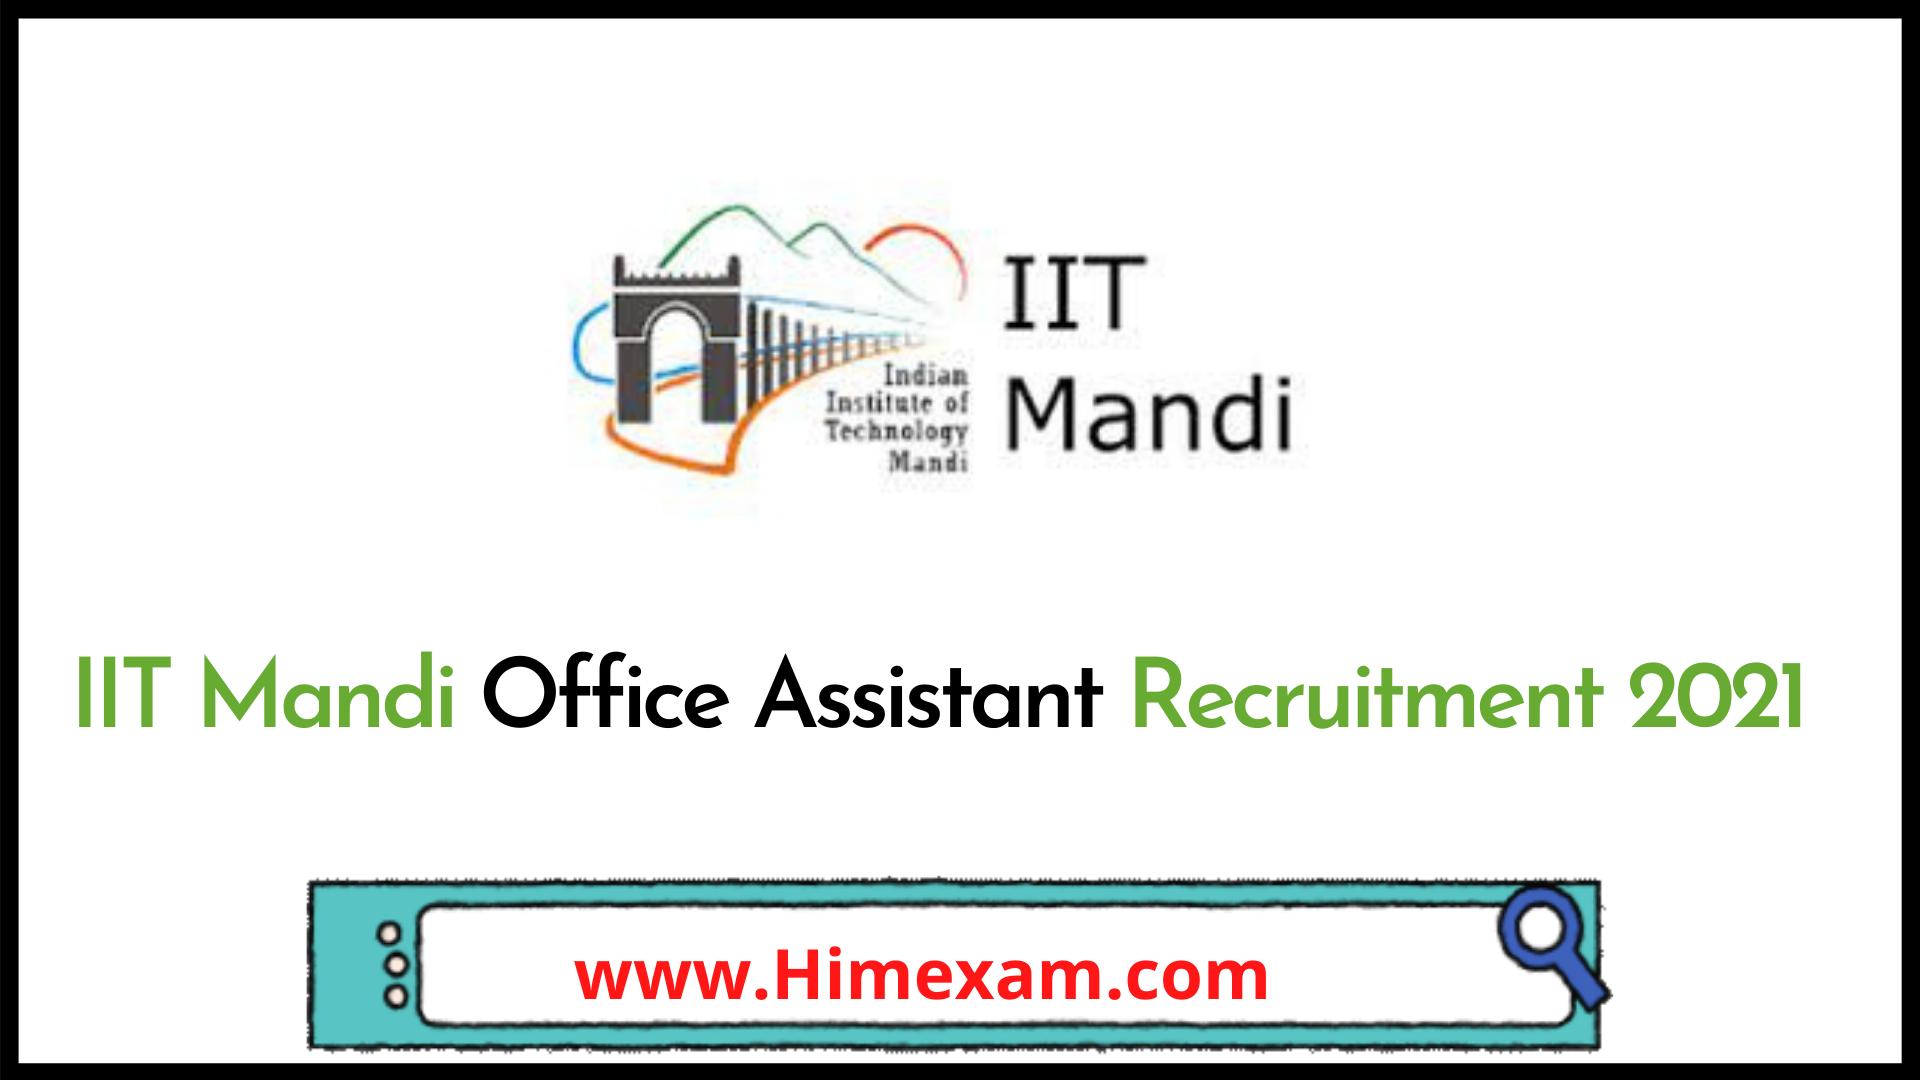 IIT Mandi Office Assistant Recruitment 2021